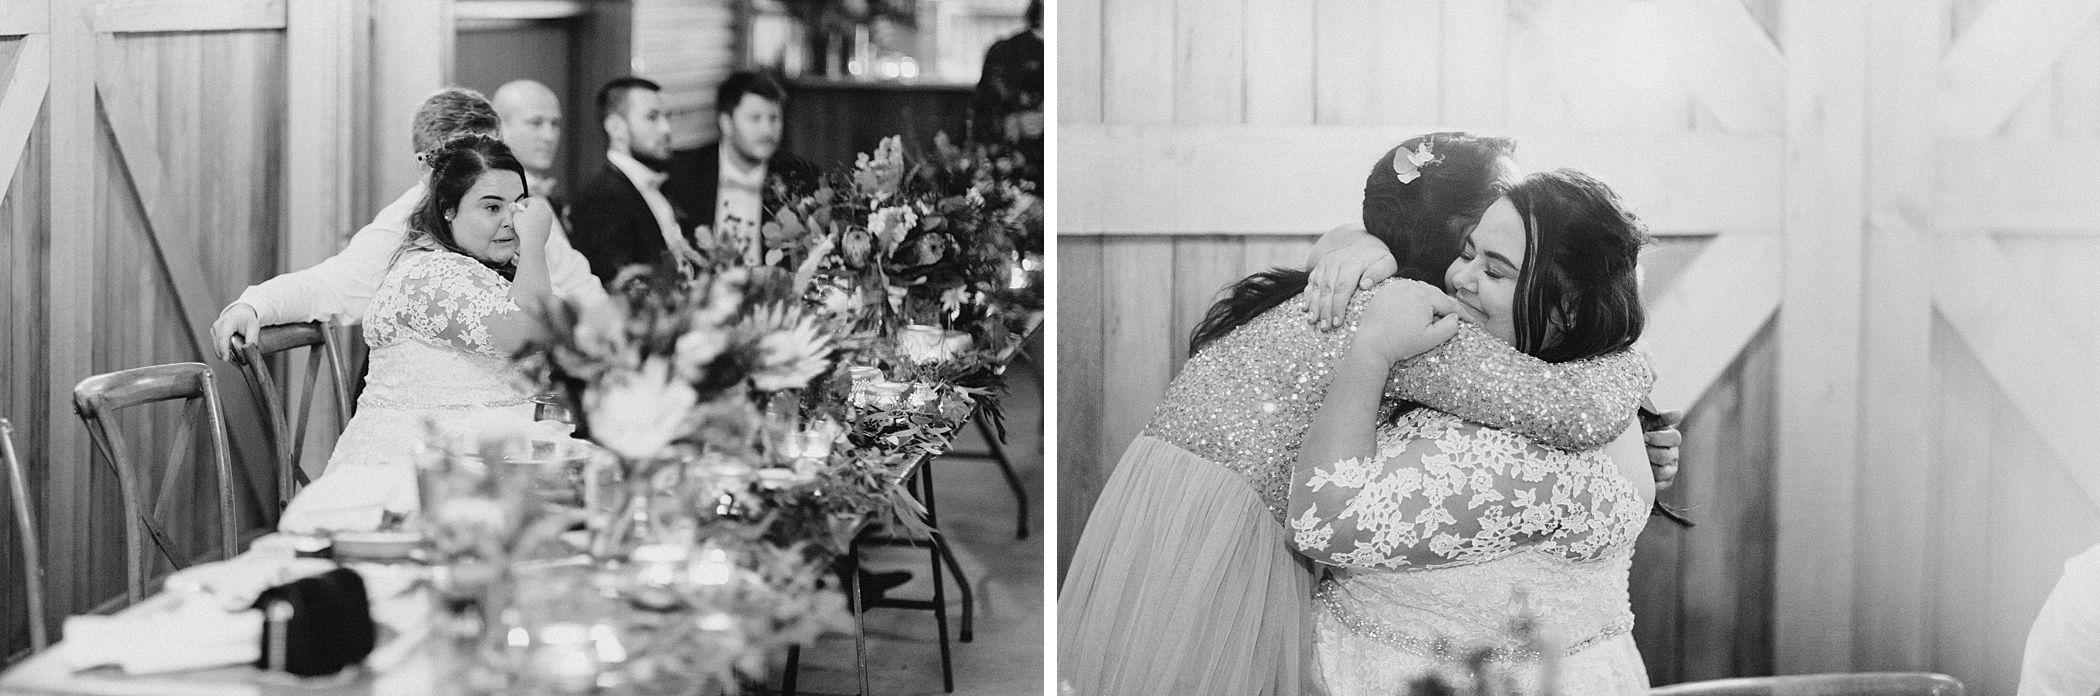 lauren-anne-photography-newcastle-hunter-valley-wedding-photographer_1265.jpg